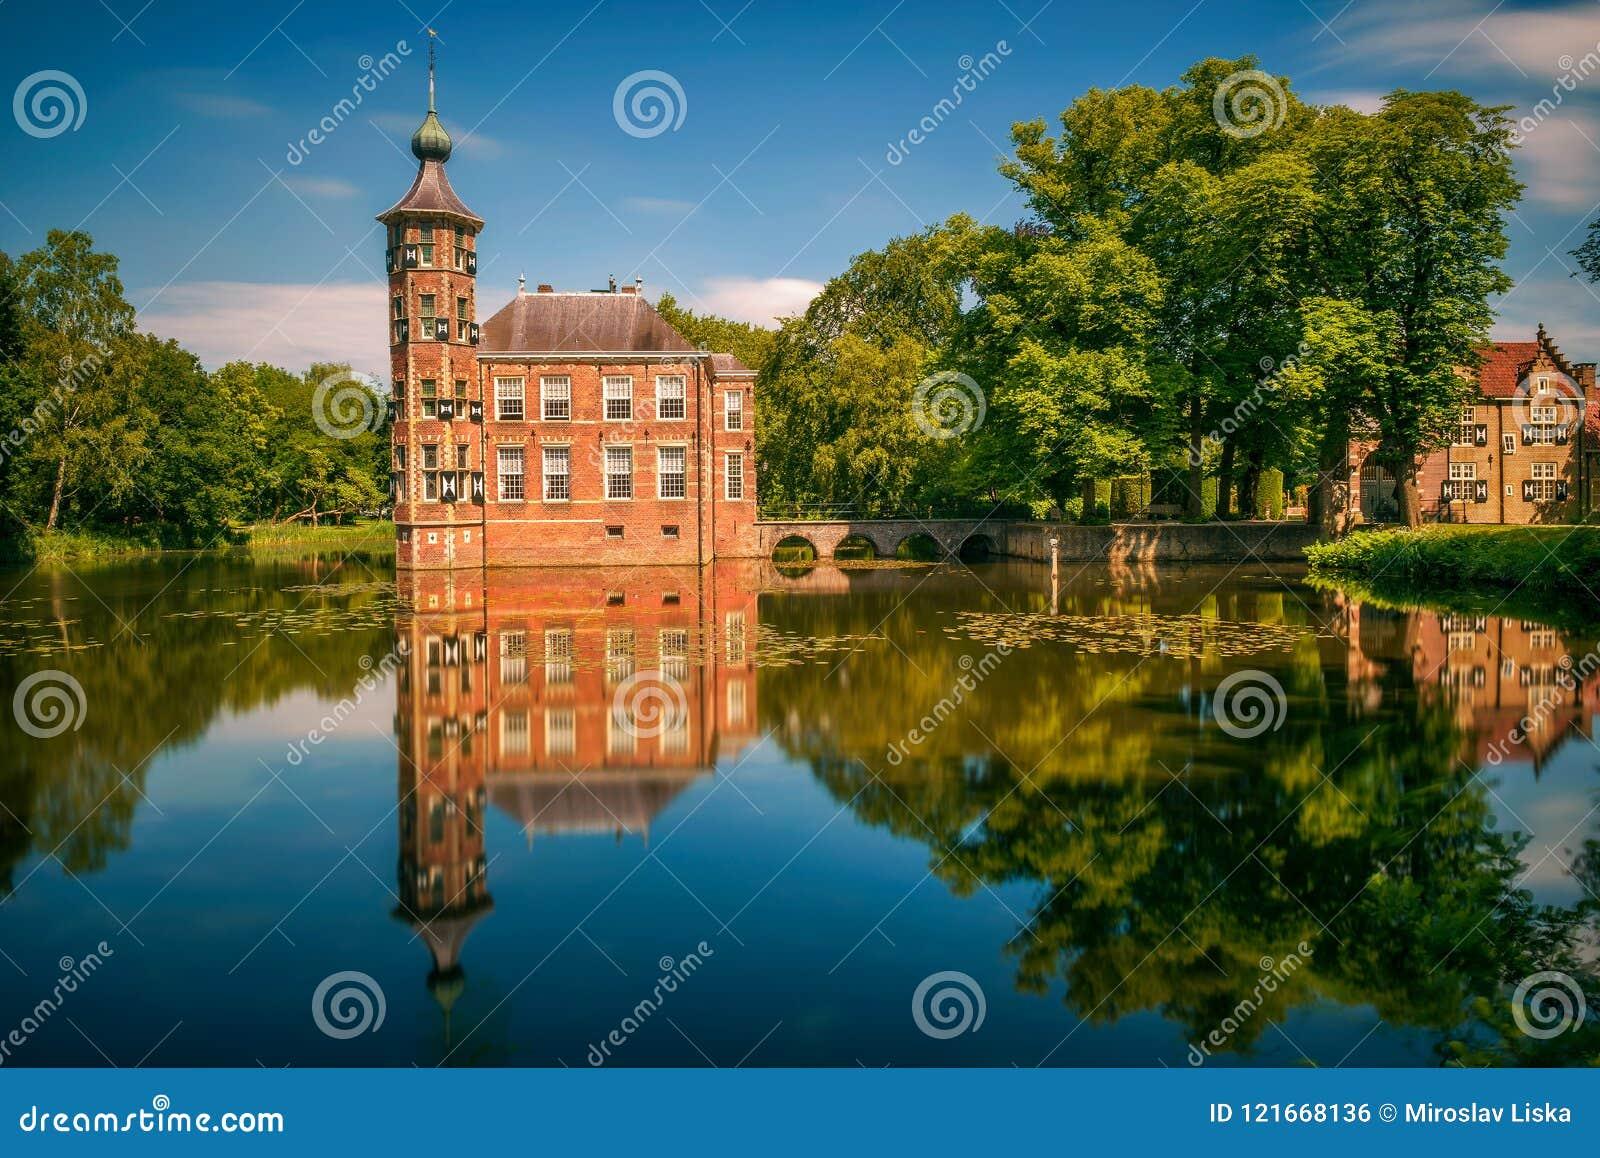 Castle Bouvigne και το περιβάλλον πάρκο στη Μπρέντα, Κάτω Χώρες